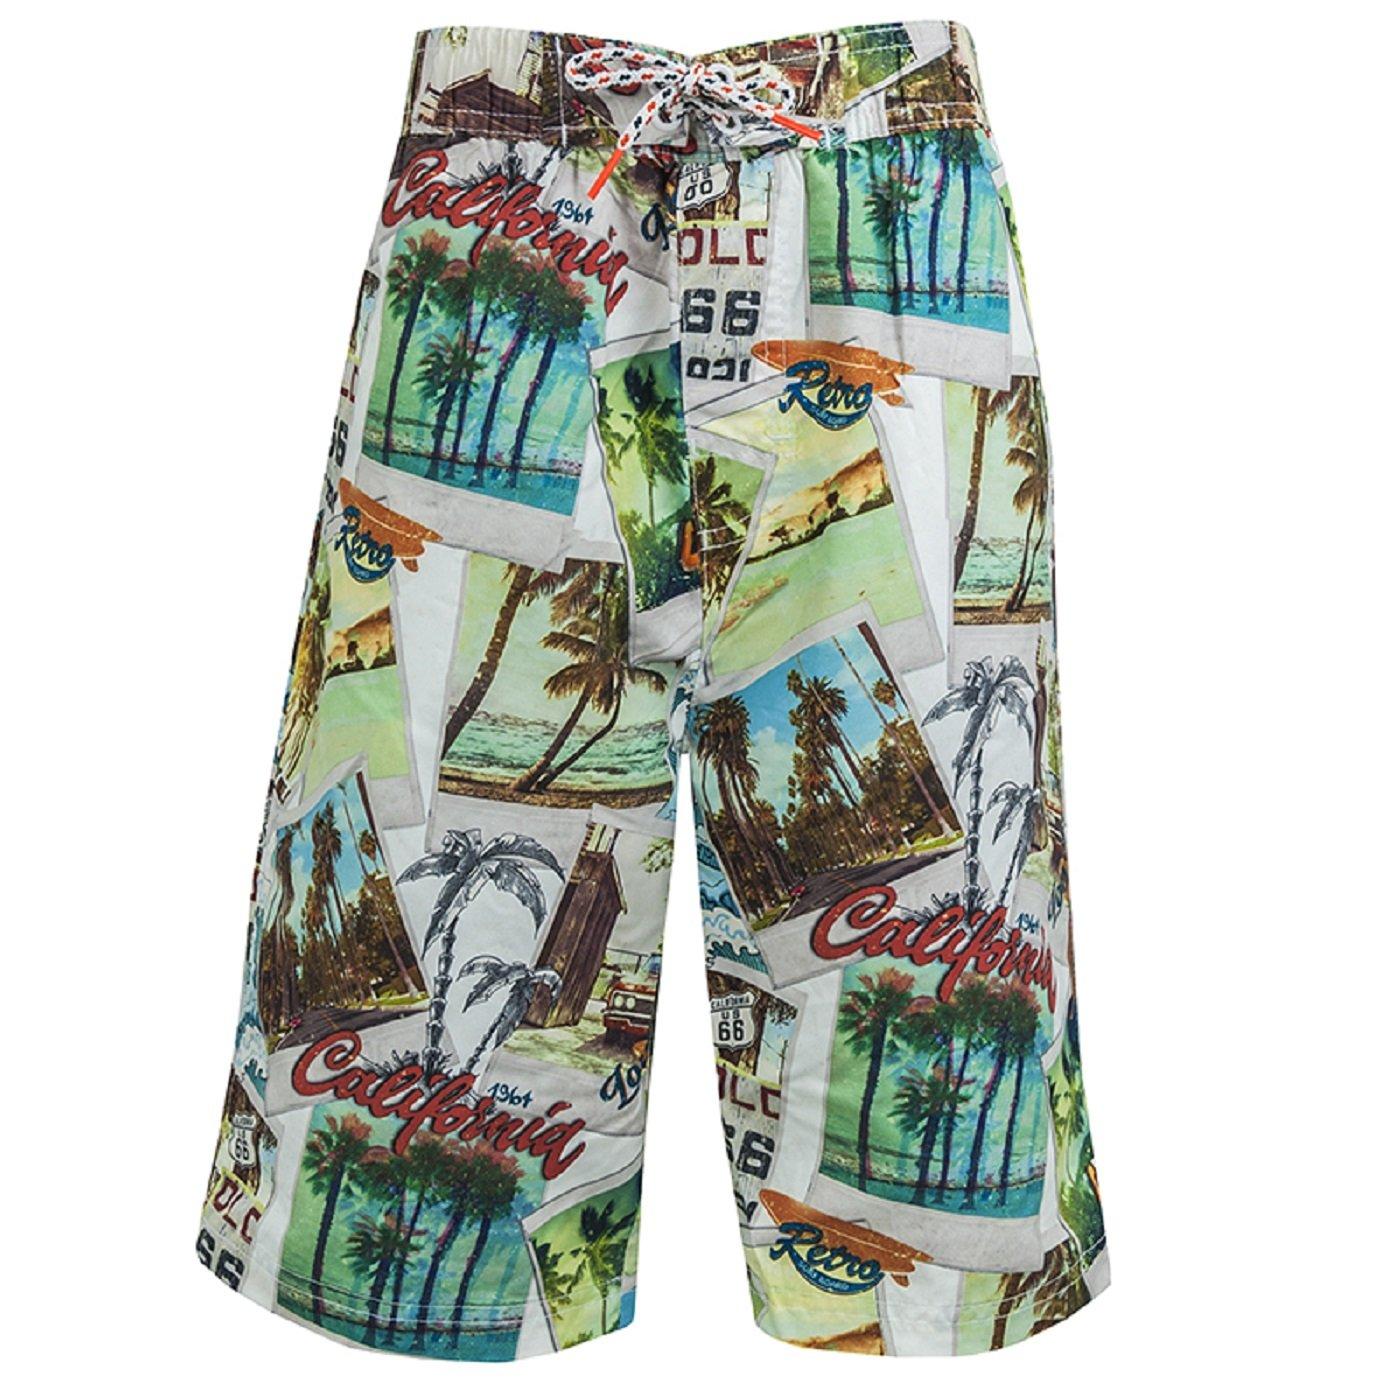 Big Boys Kids Long Knee Length Swim Shorts Swim Trunks Children Surf Board Wear Mesh Lined Blue Black White Printed Size XXS - L 9 10 11 12 13 14 15 16 Years